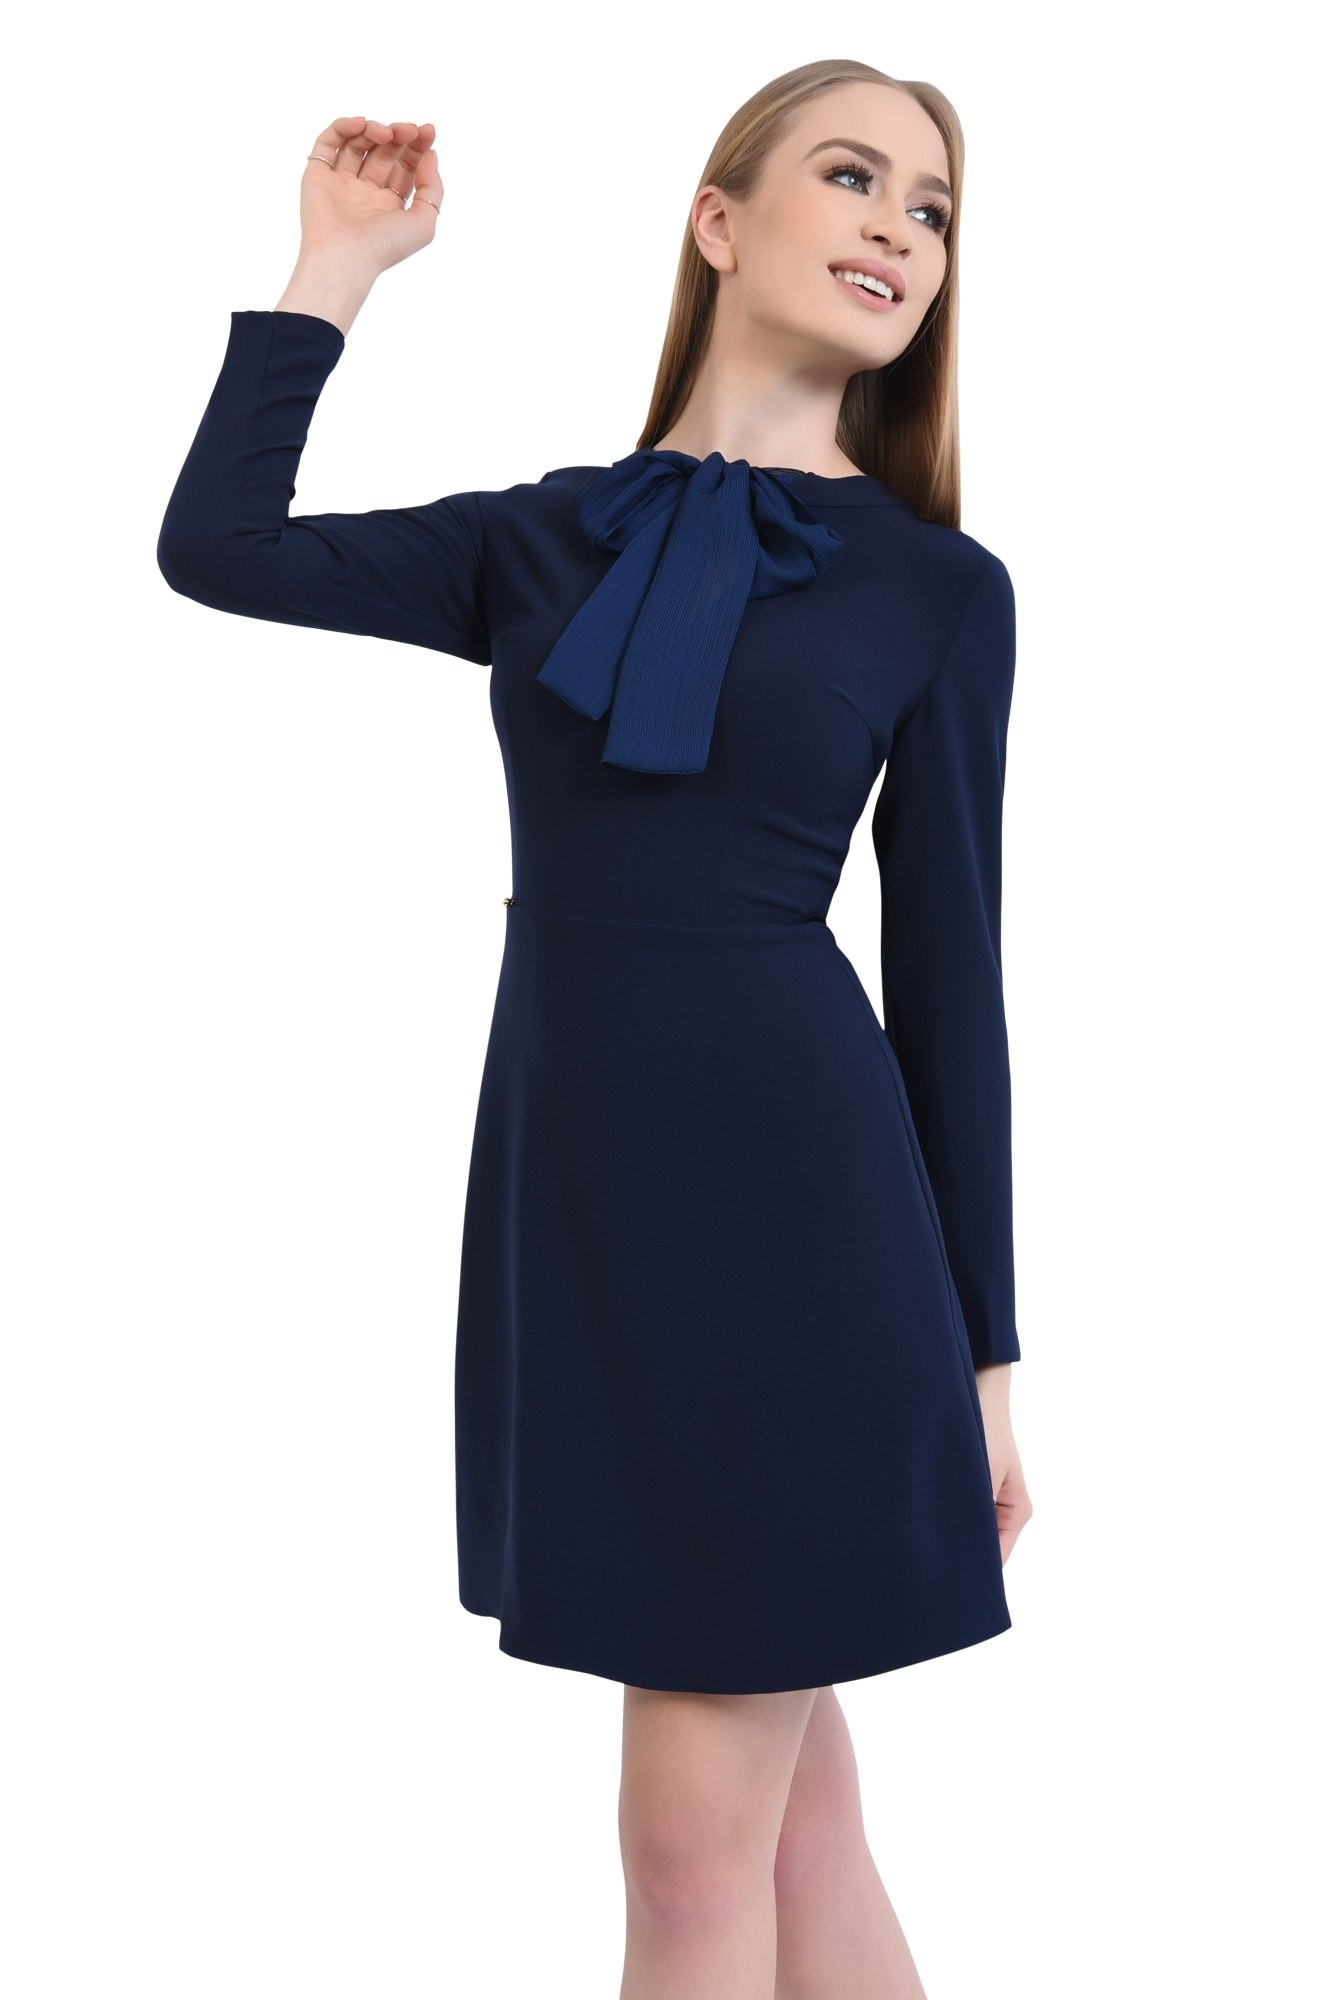 rochie mini, croi A-line, talie cambrata, rochii online